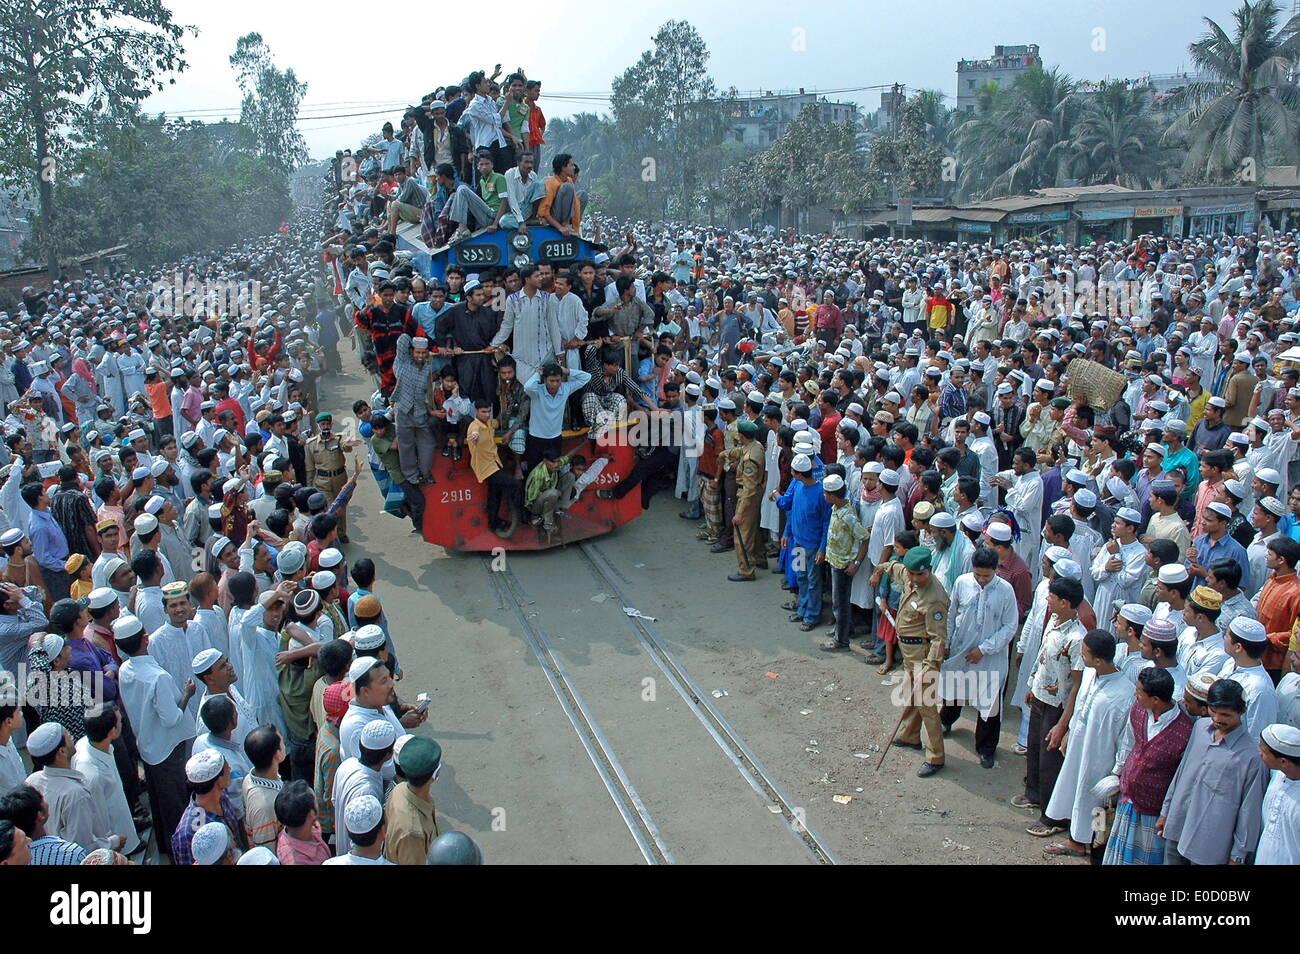 https://c7.alamy.com/comp/E0D0BW/overcrowded-train-and-station-for-join-the-akheri-munajat-bishwa-ijtematongi-E0D0BW.jpg